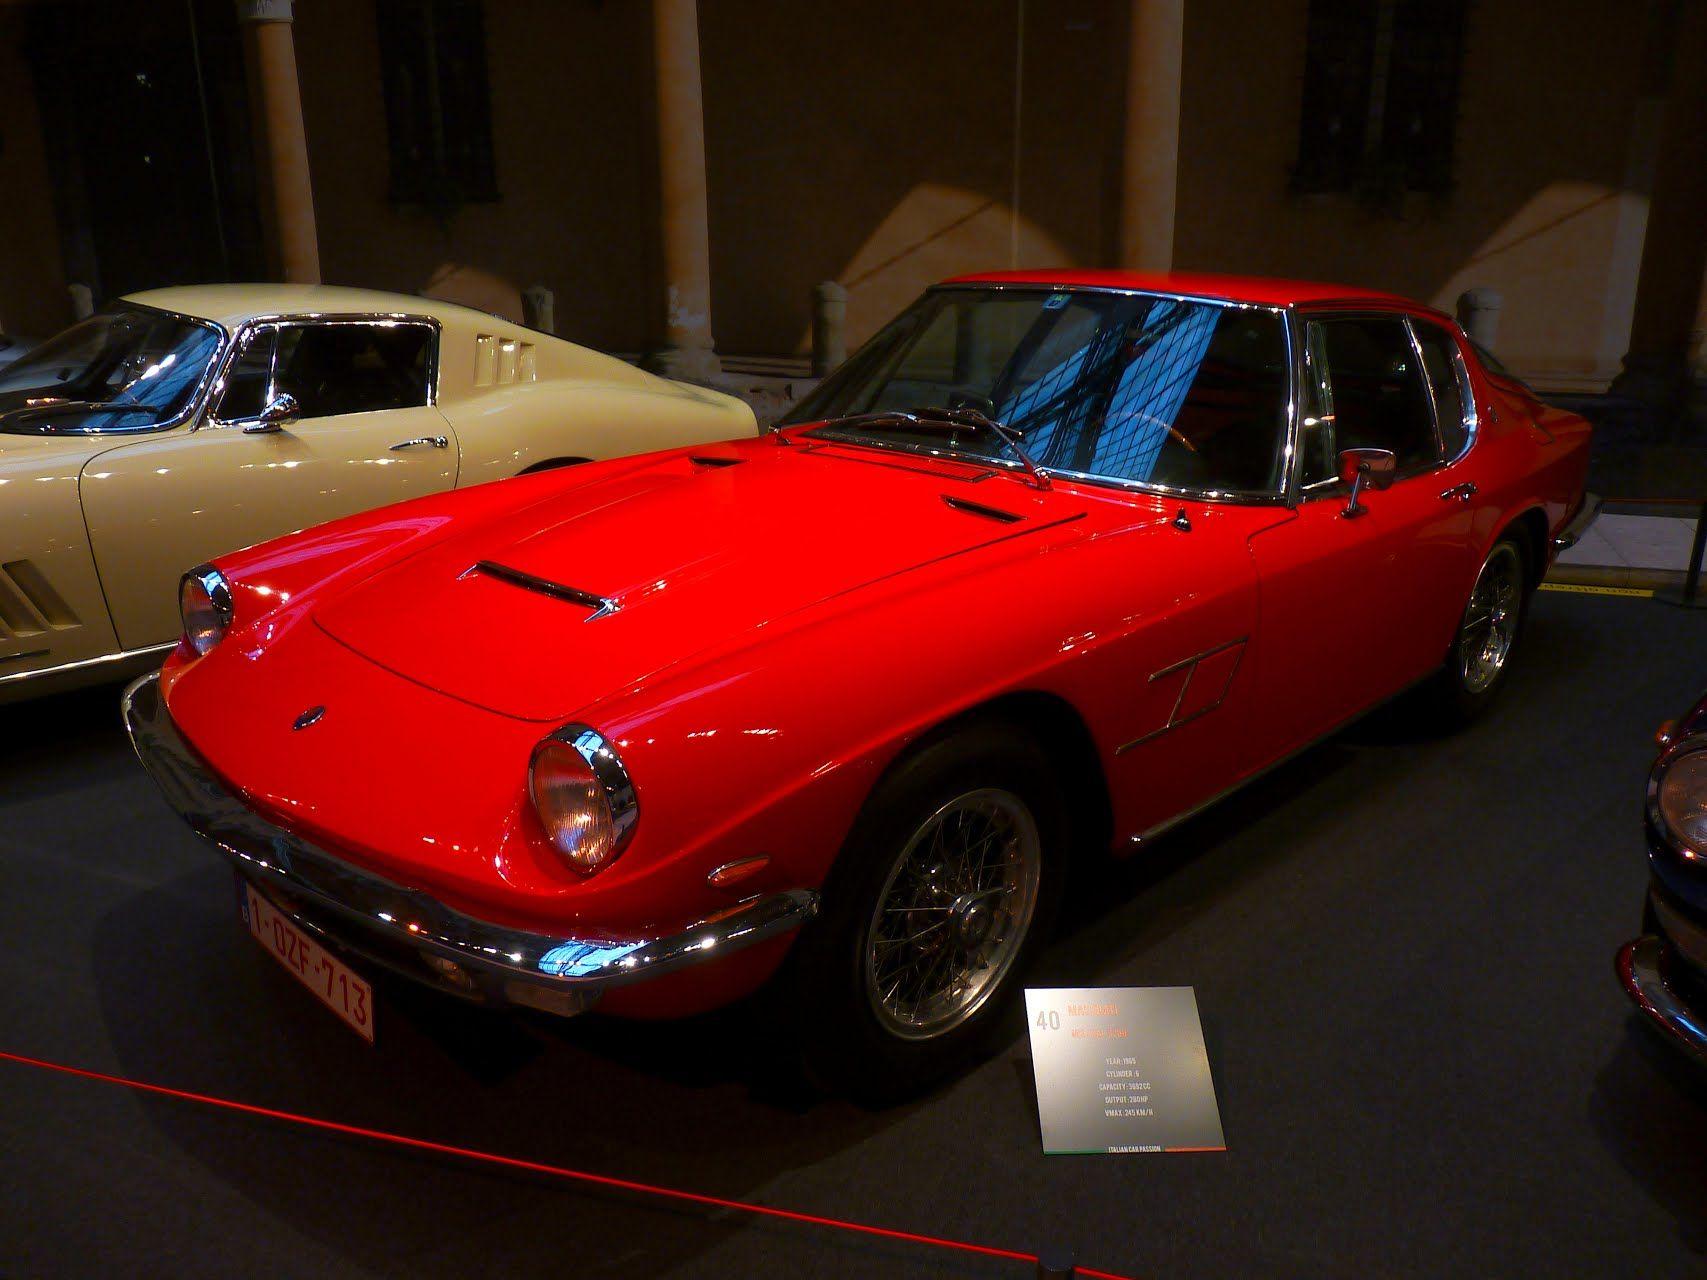 Maserati Mistral 3700 1965 | Maserati, Classic cars, Cool cars